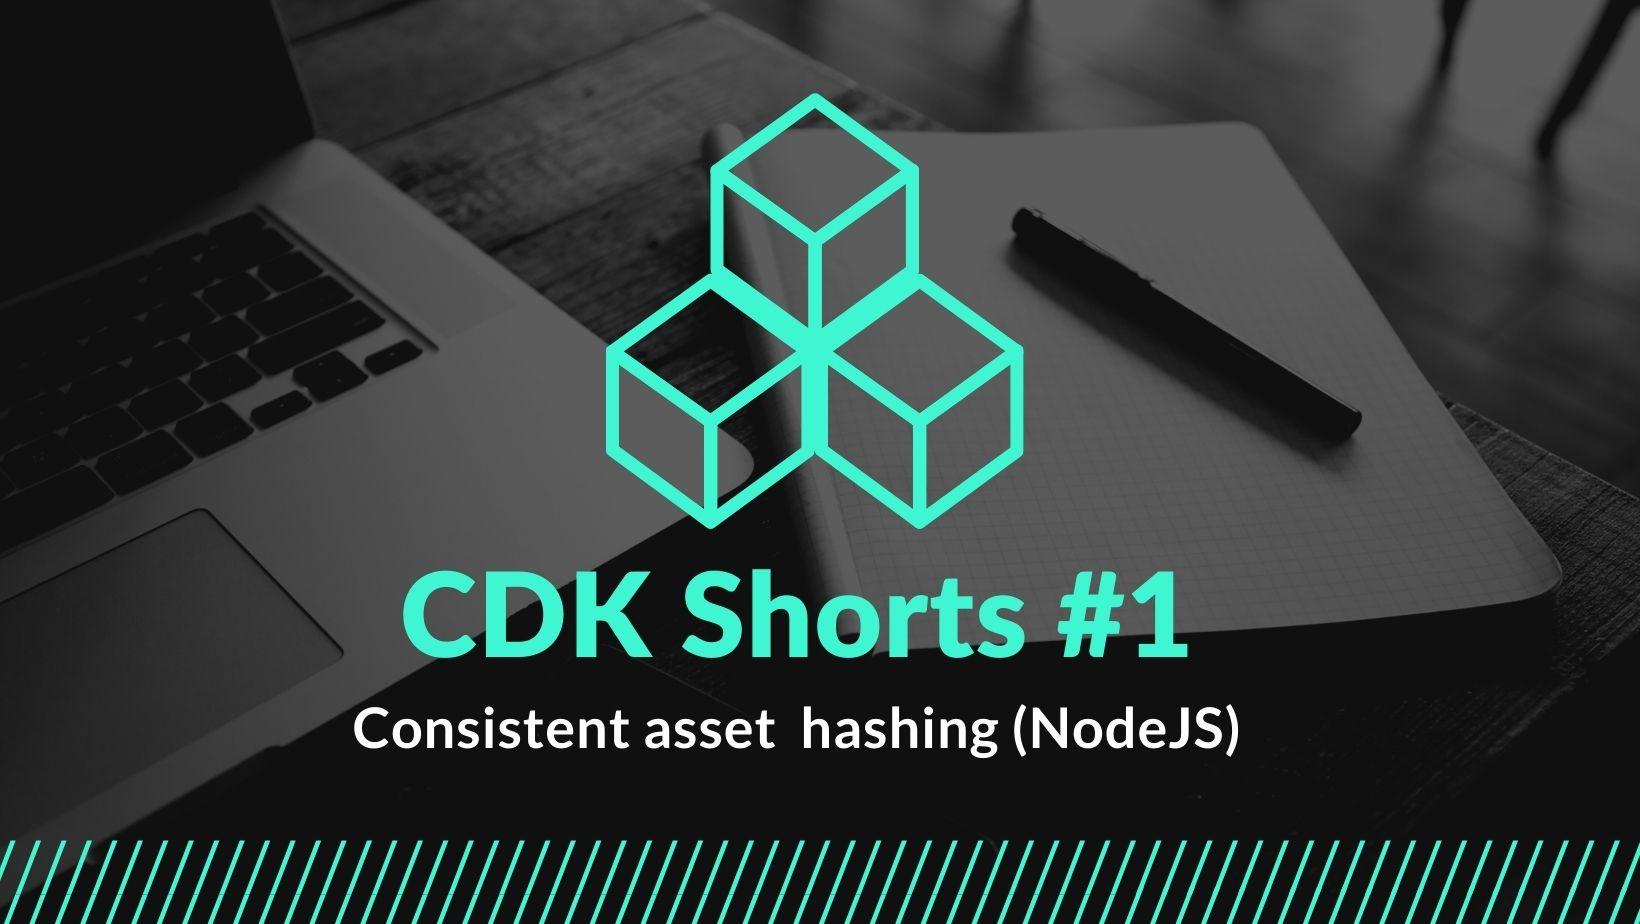 CDK Shorts #1 – Consistent asset hashing (NodeJS)